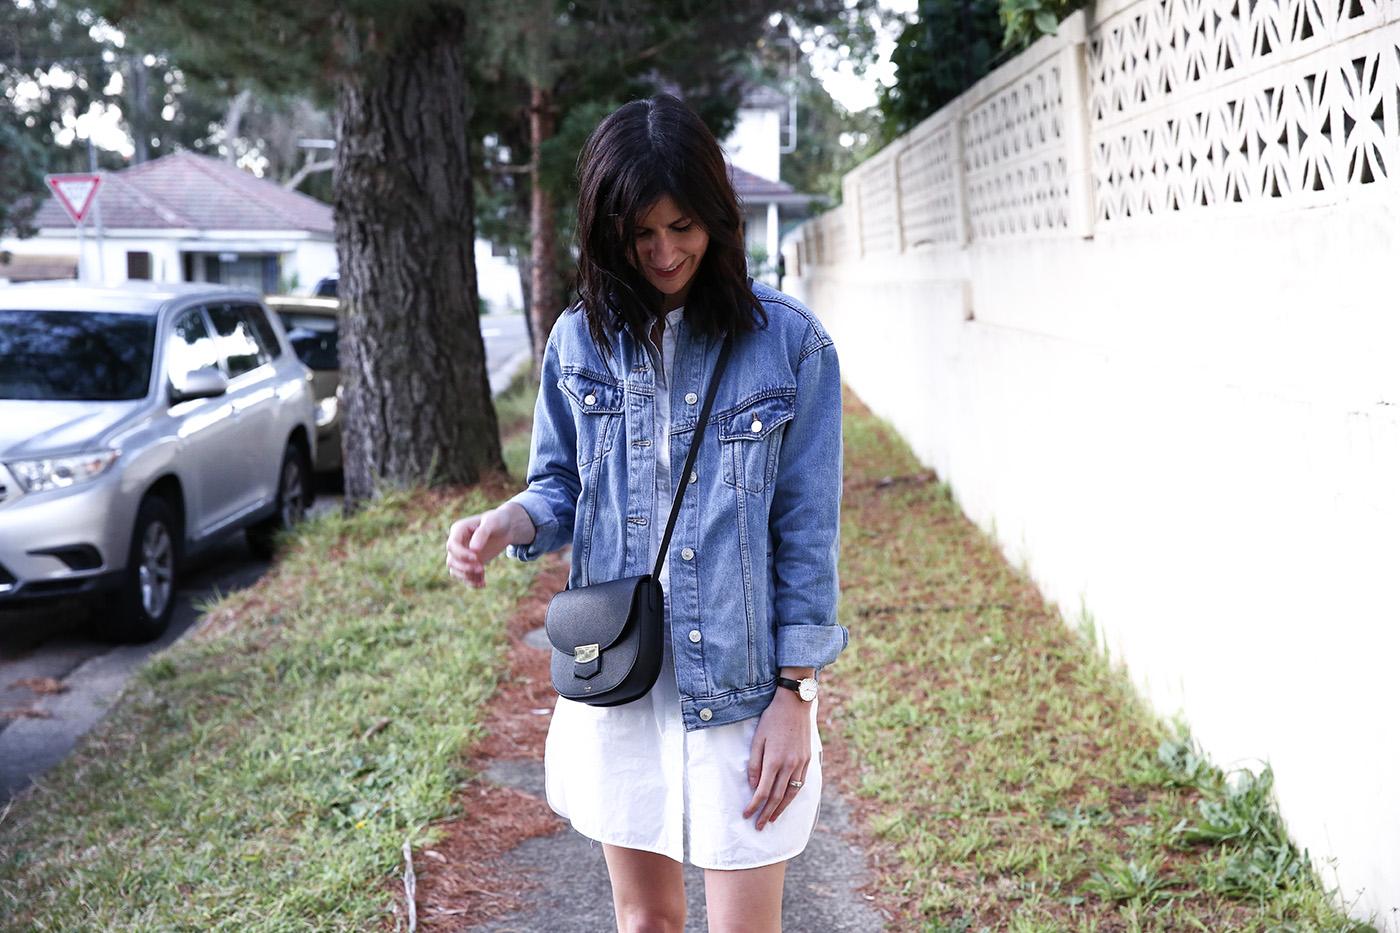 spring wardrobe essential denim jacket mademoiselle minimal outfit